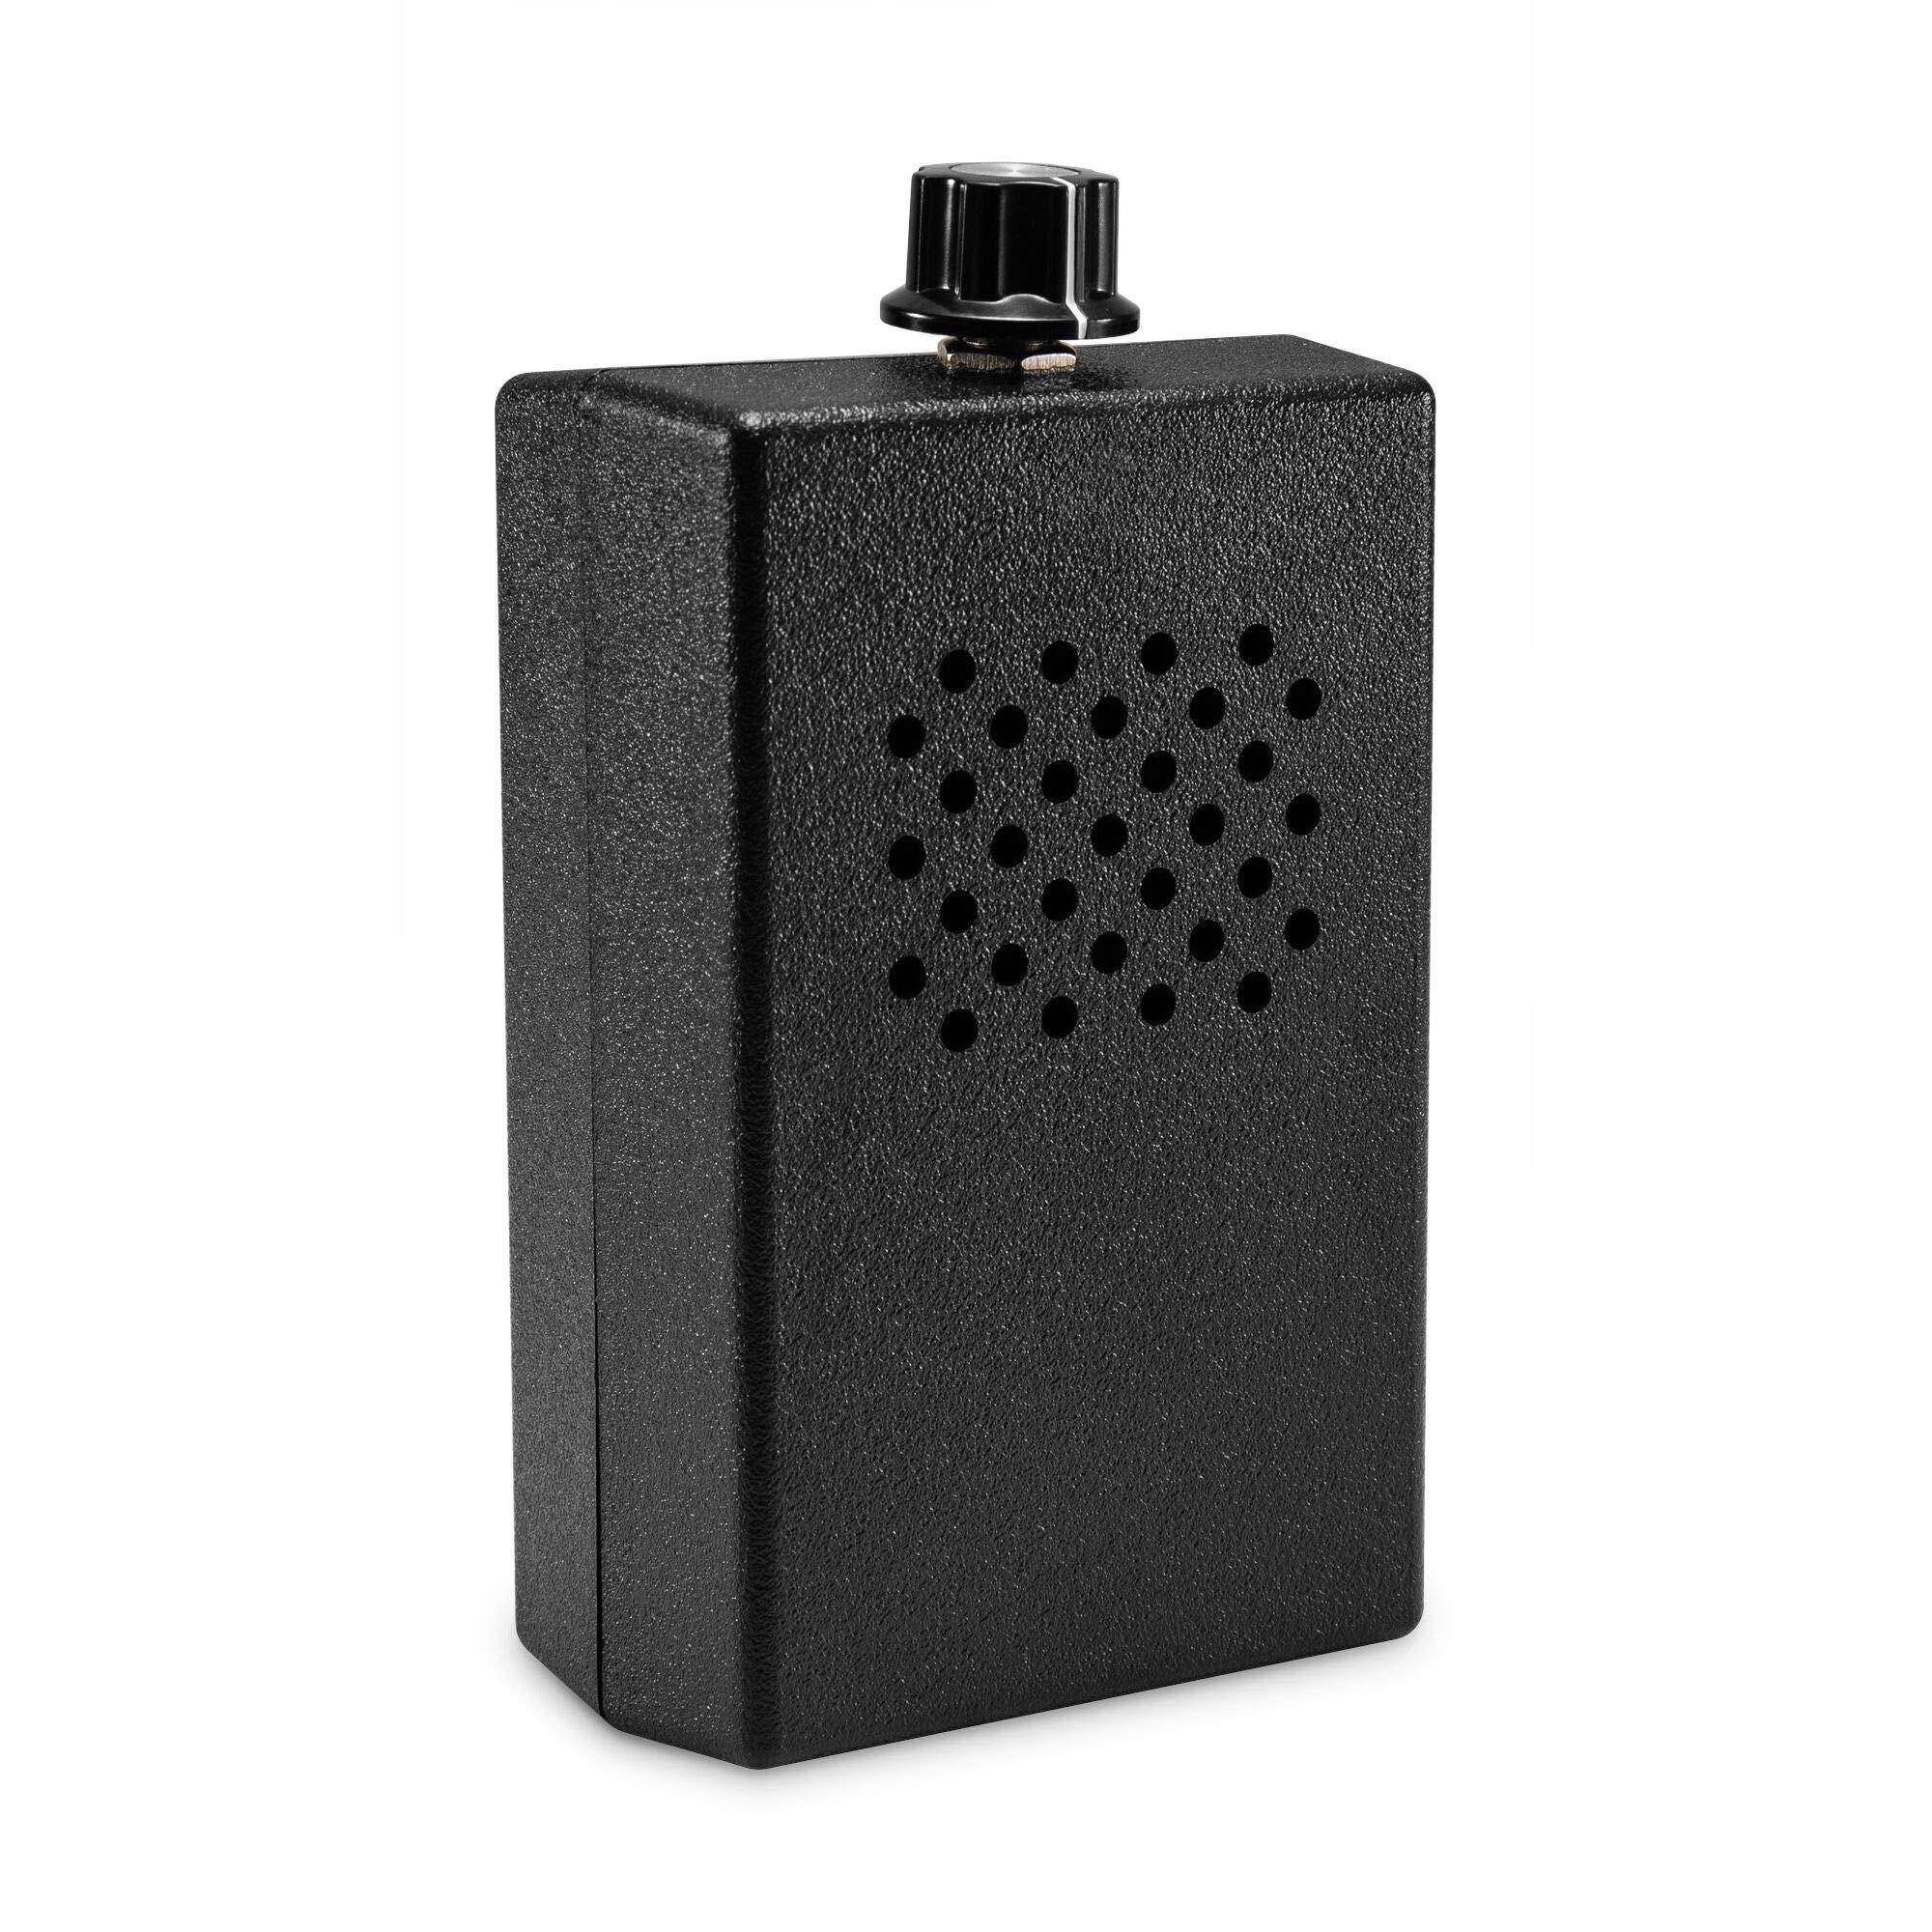 SpyTec LD-AJ1000 Audio Jammer Counter Surveillance Anti Eavesdrop White Noise Generator w/ 150 sq ft per unit range